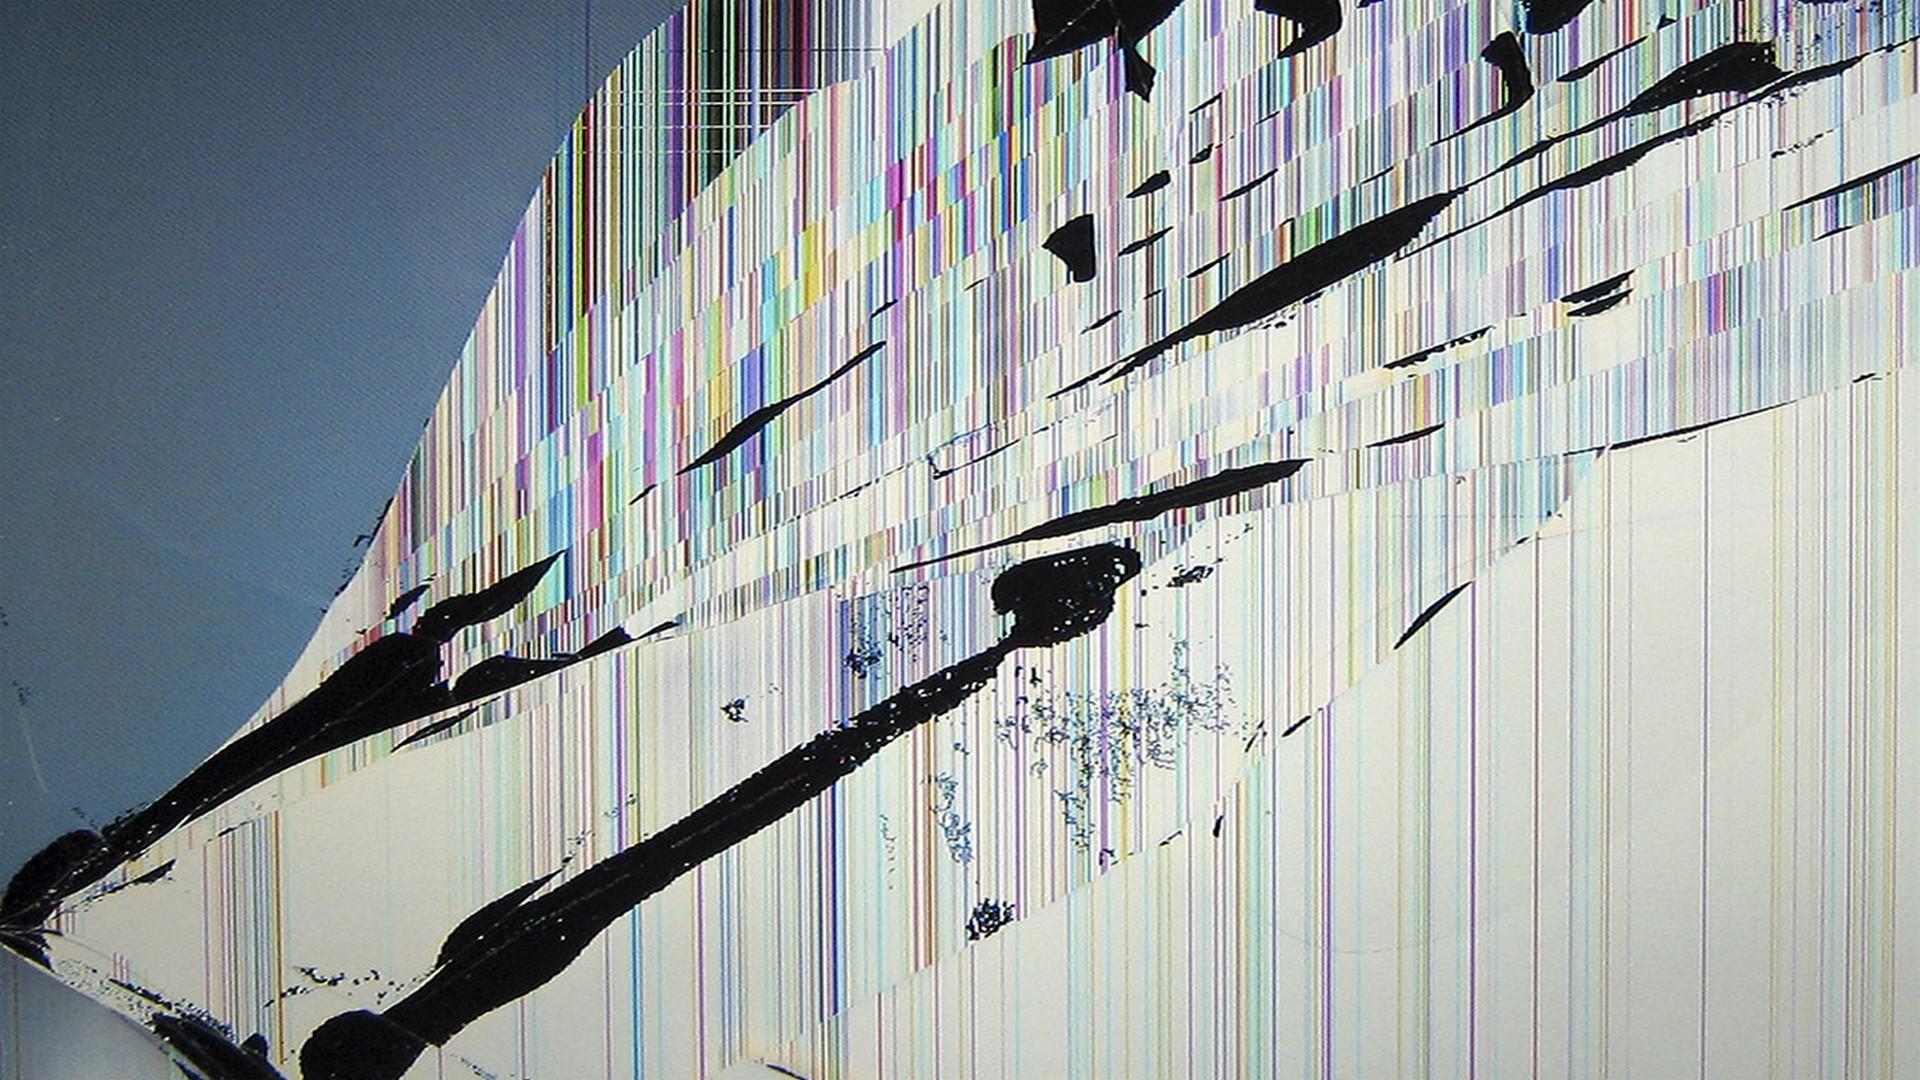 Download Free Broken Screen Wallpaper 1920x1080 Lockscreen